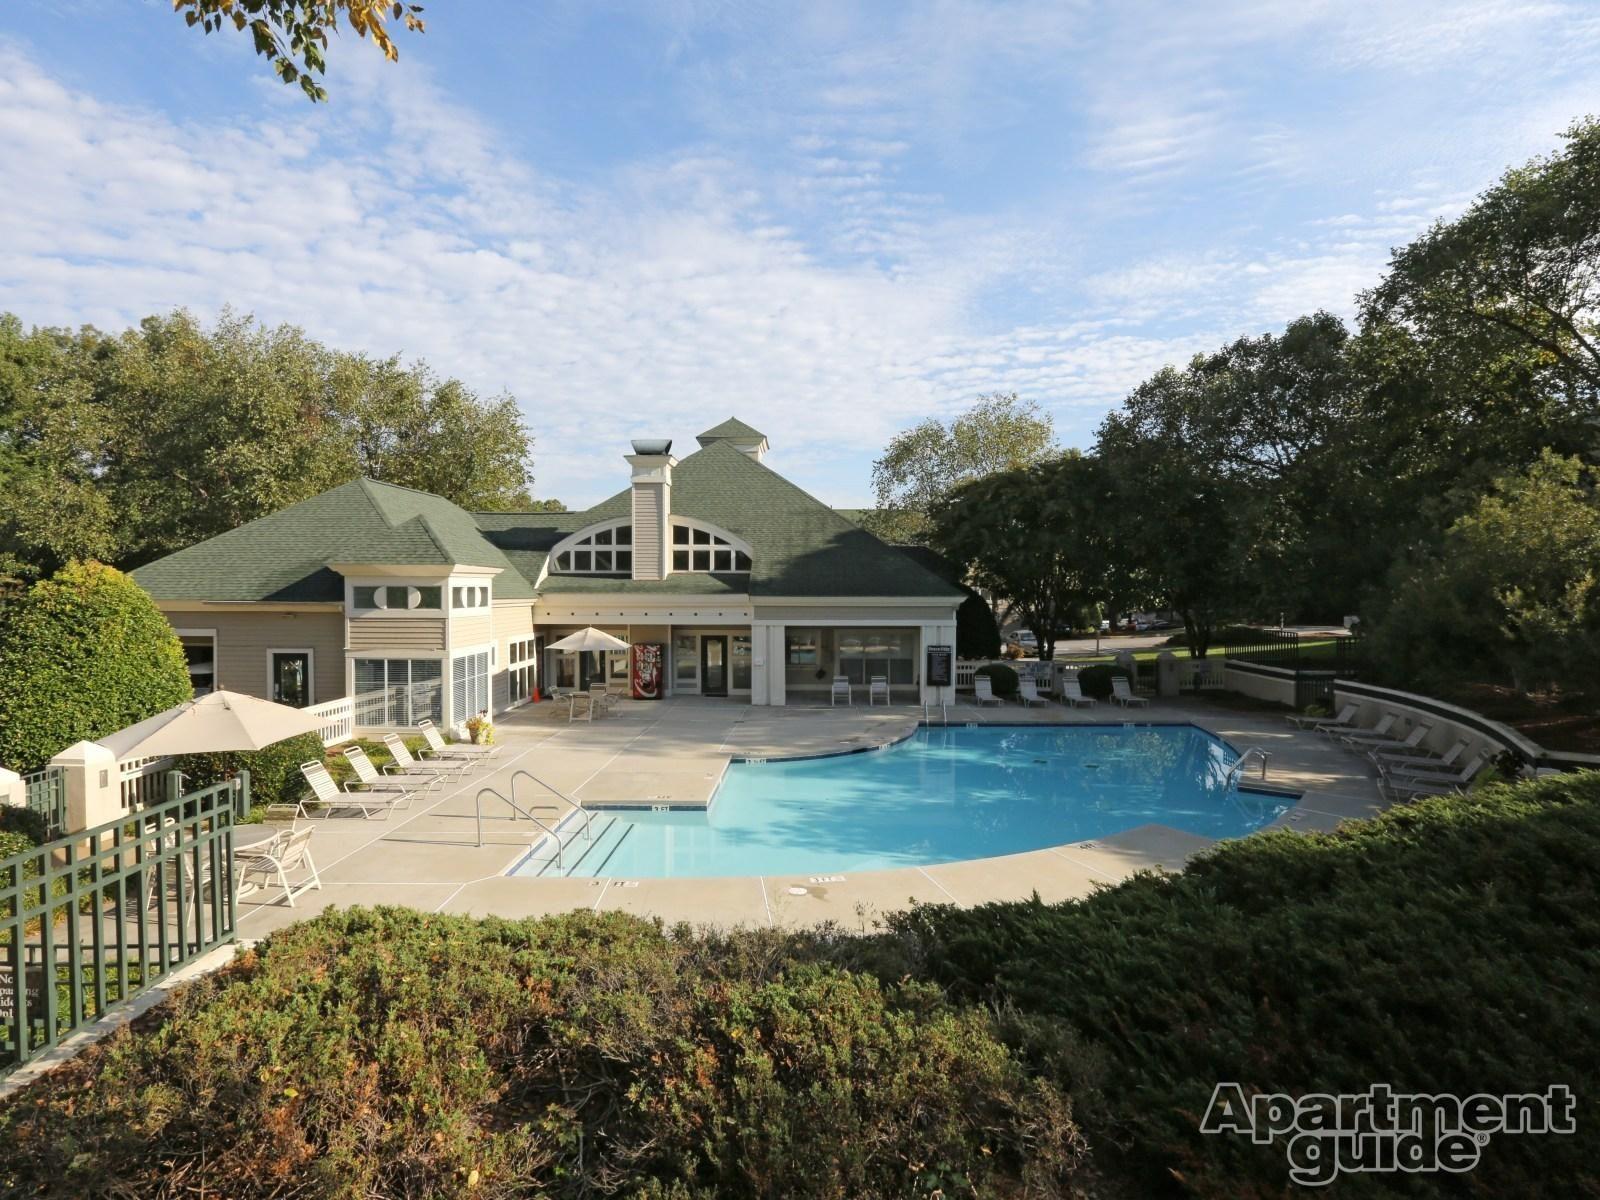 Beacon Ridge, Greenville Trulia Trulia, House styles